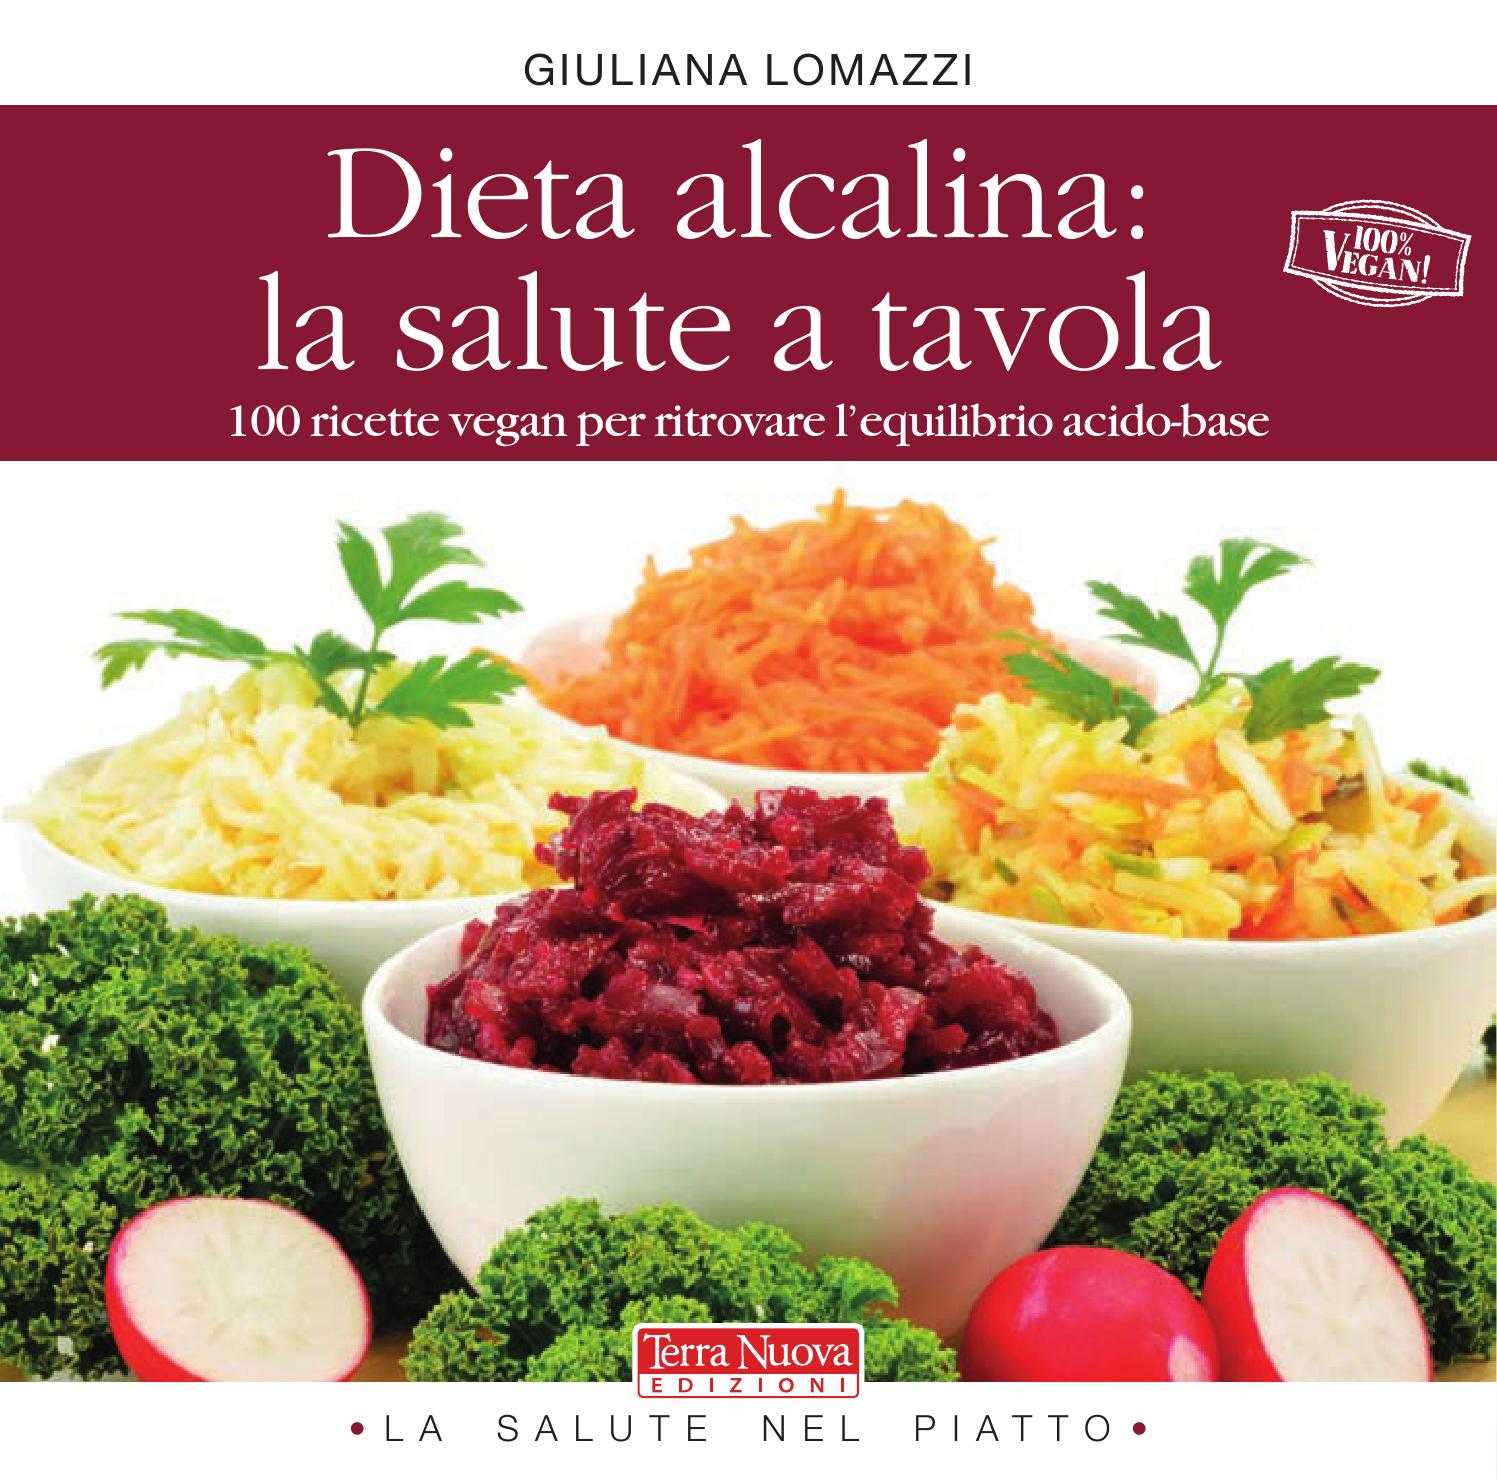 la dieta alcalina acida per una salute ottimales